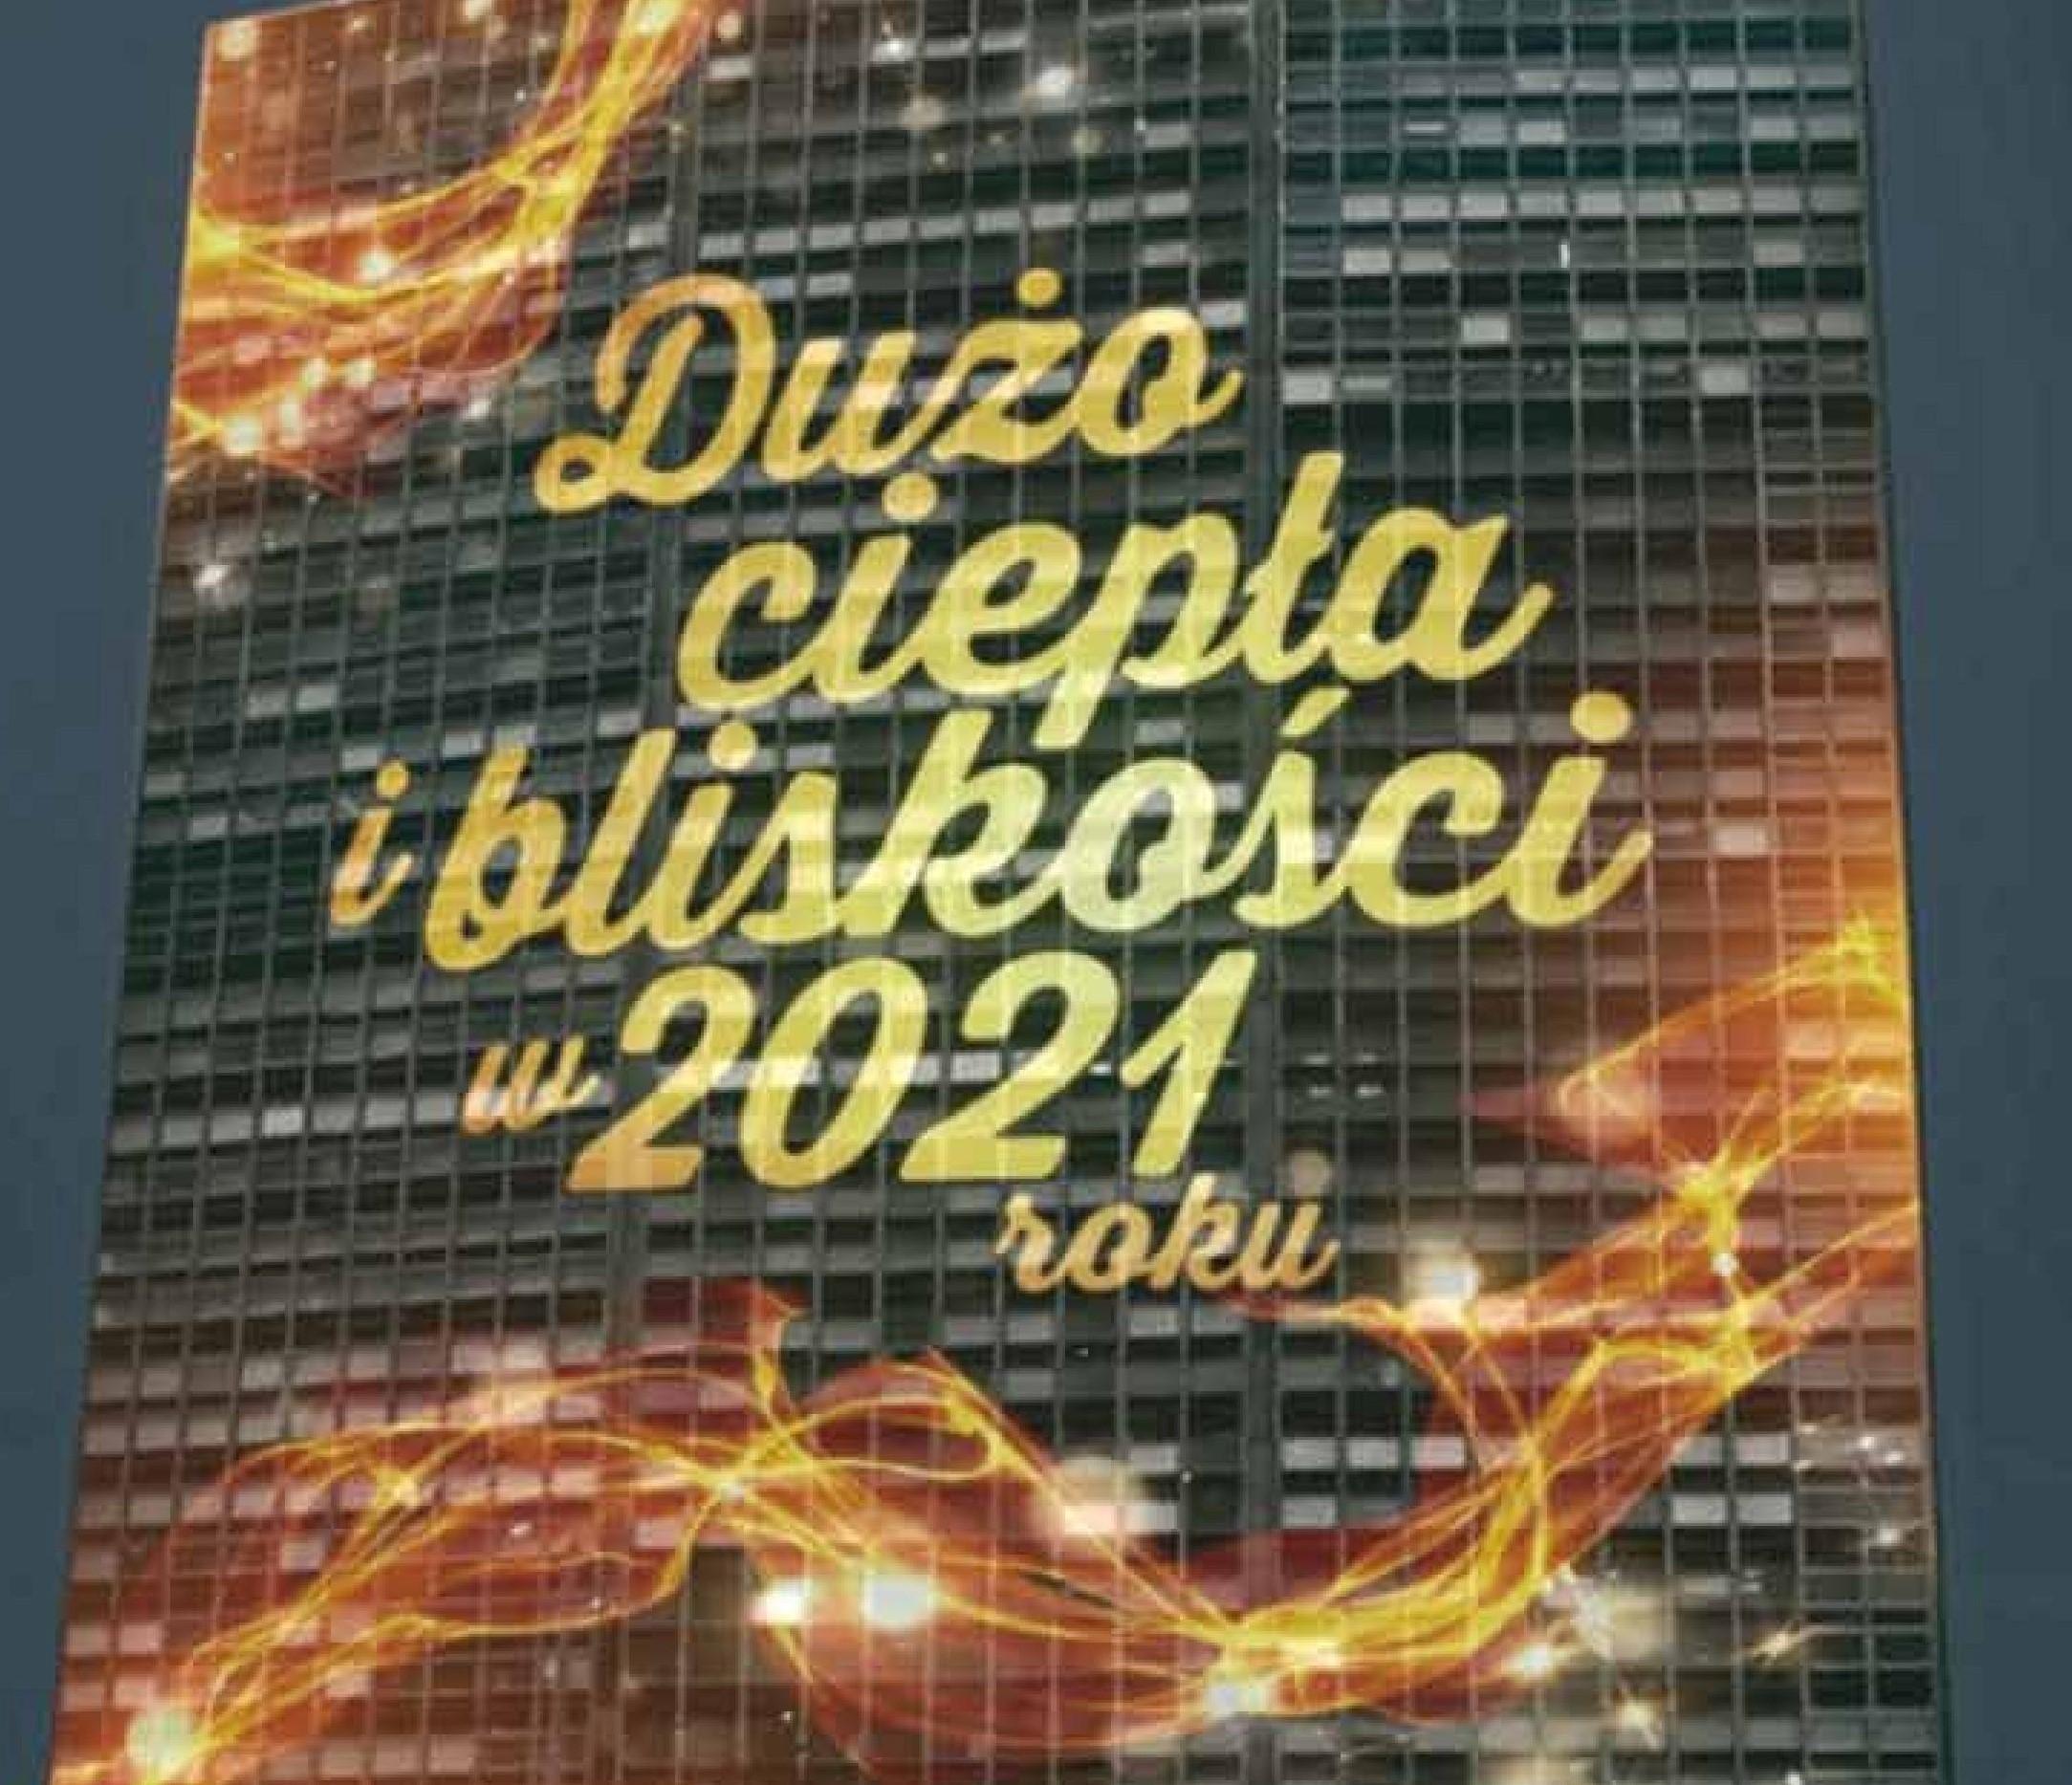 NG I 2021 do netu-page-001 kartka